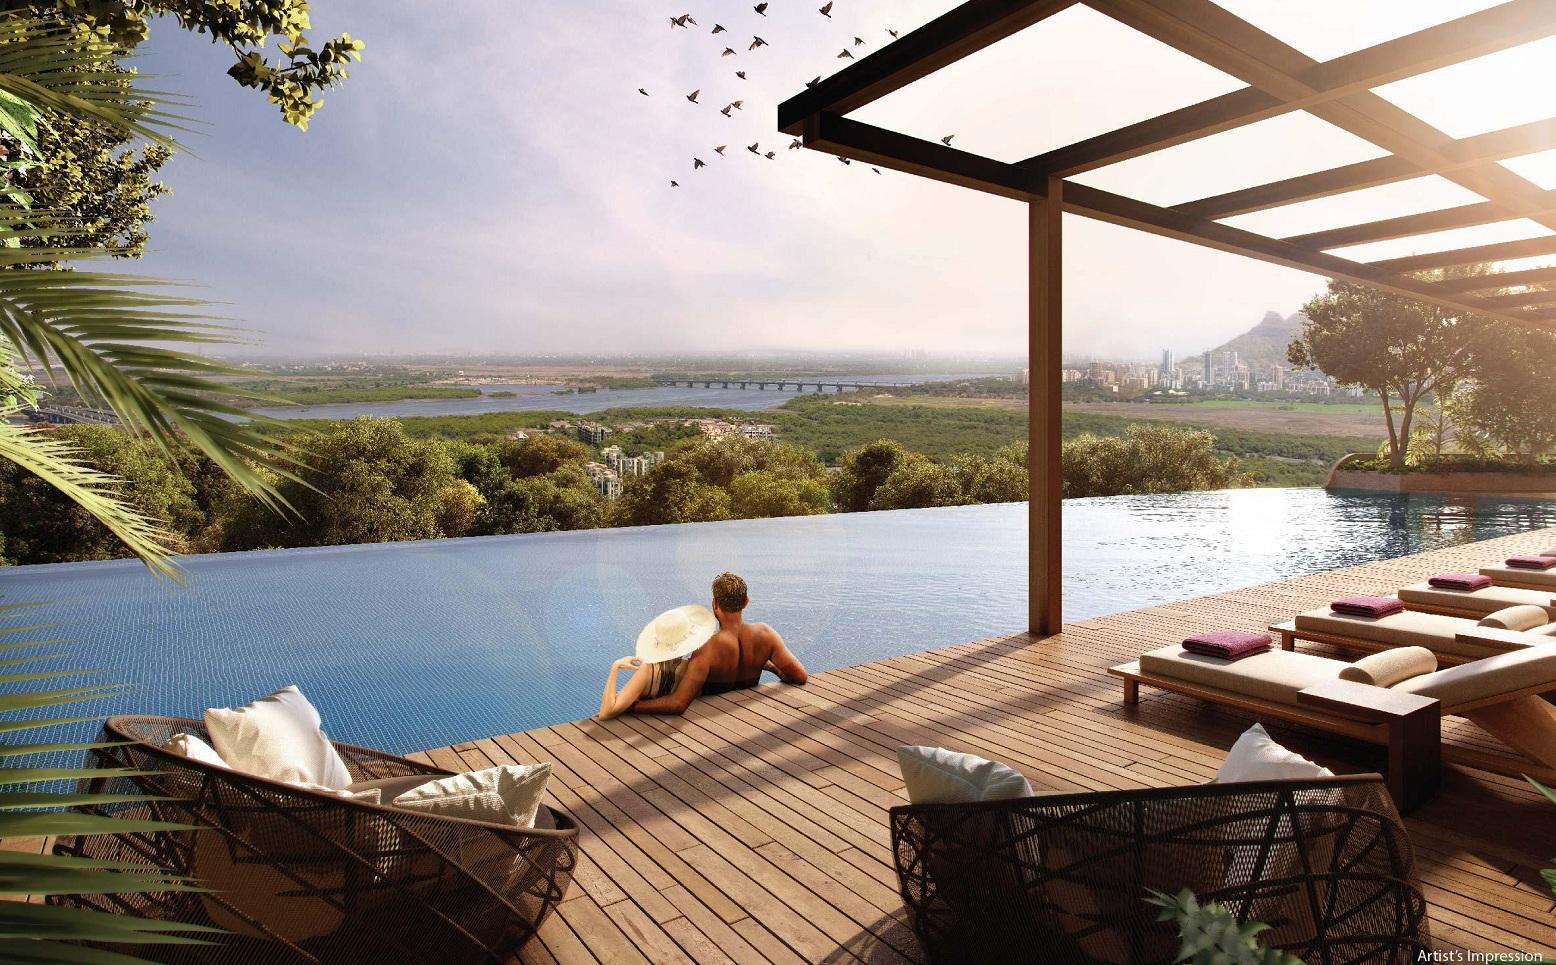 piramal vaikunth project amenities features10